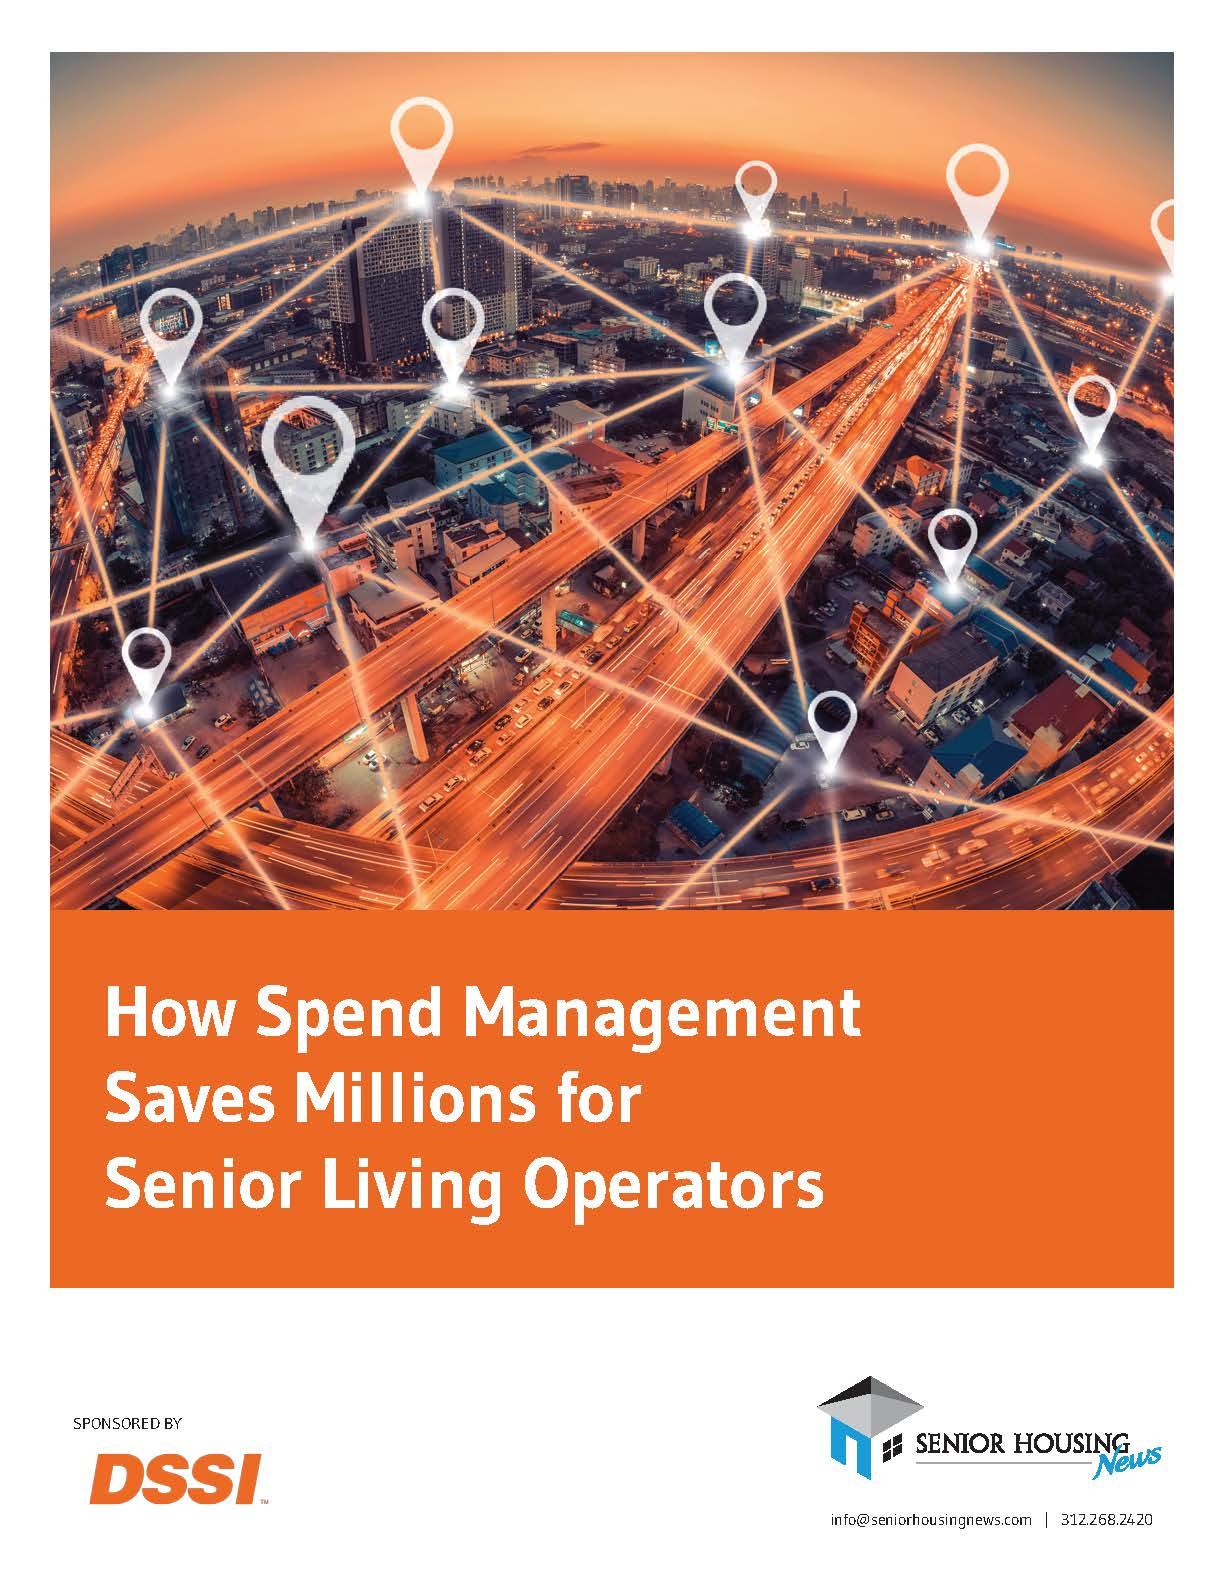 How Spend Management Saves Millions for Senior Living Operators